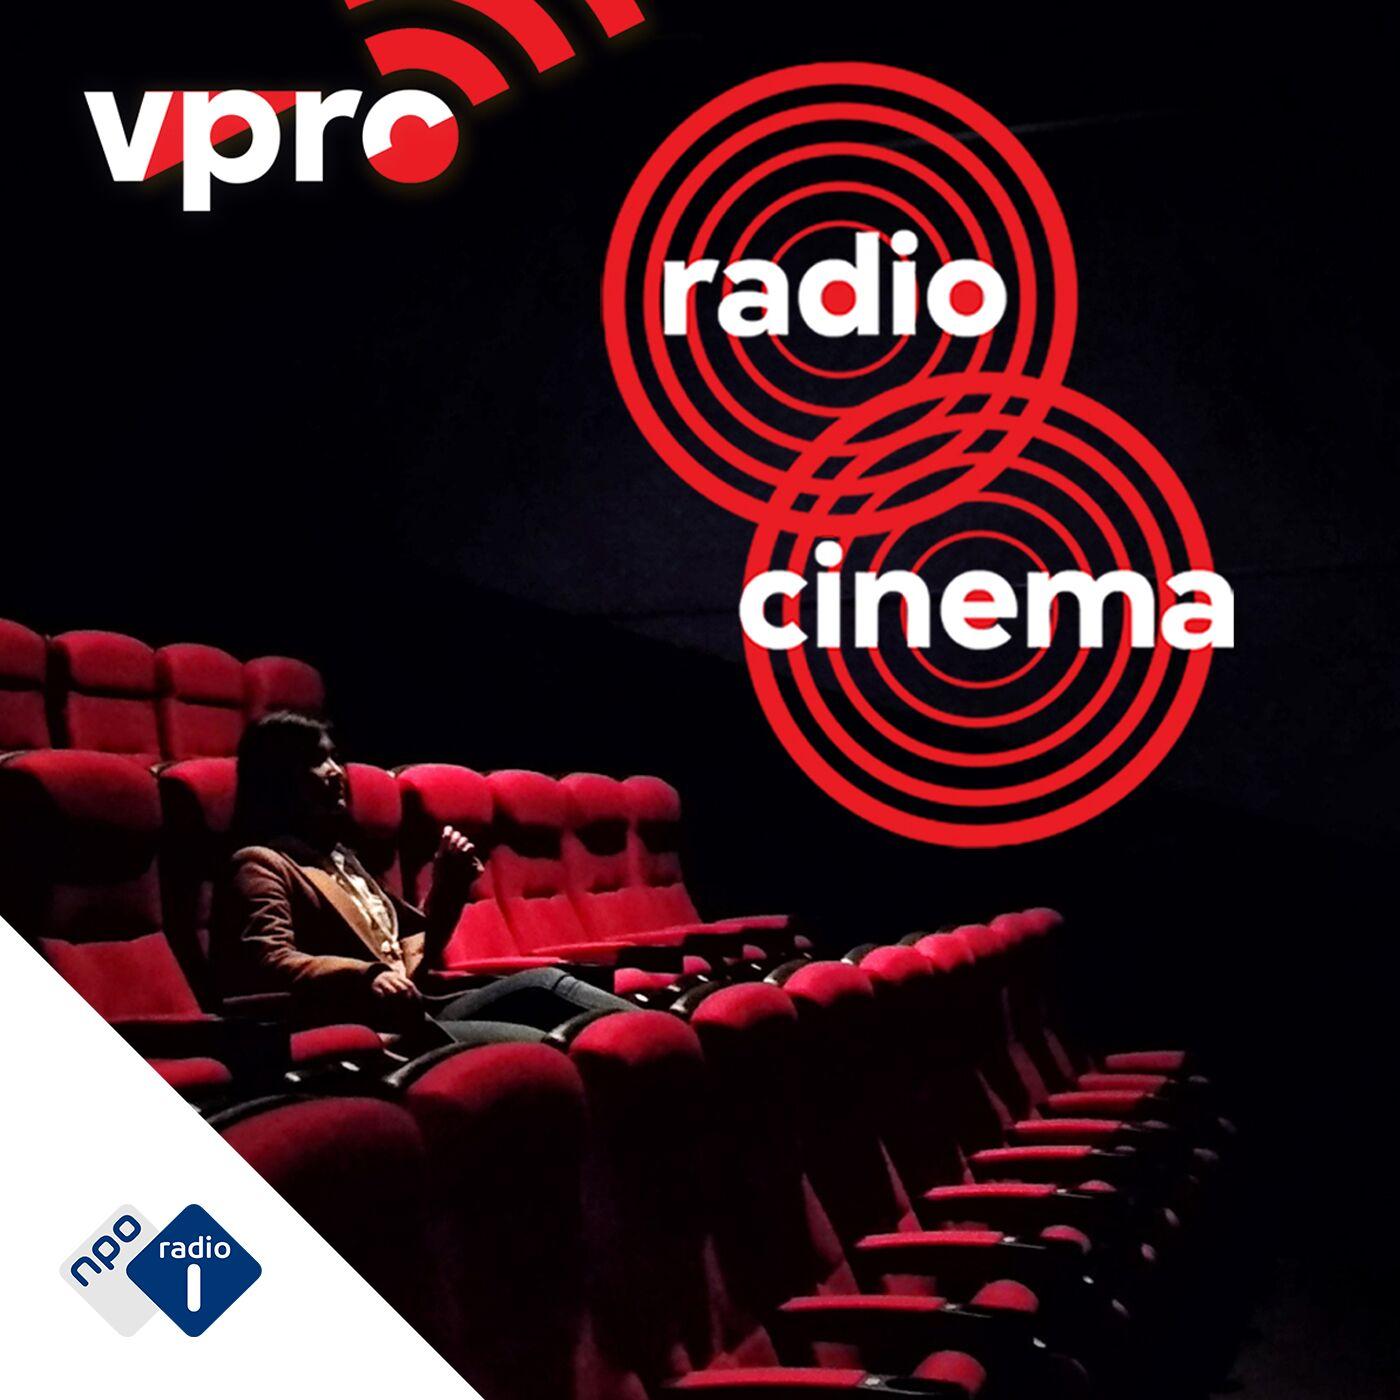 Radio Cinema logo